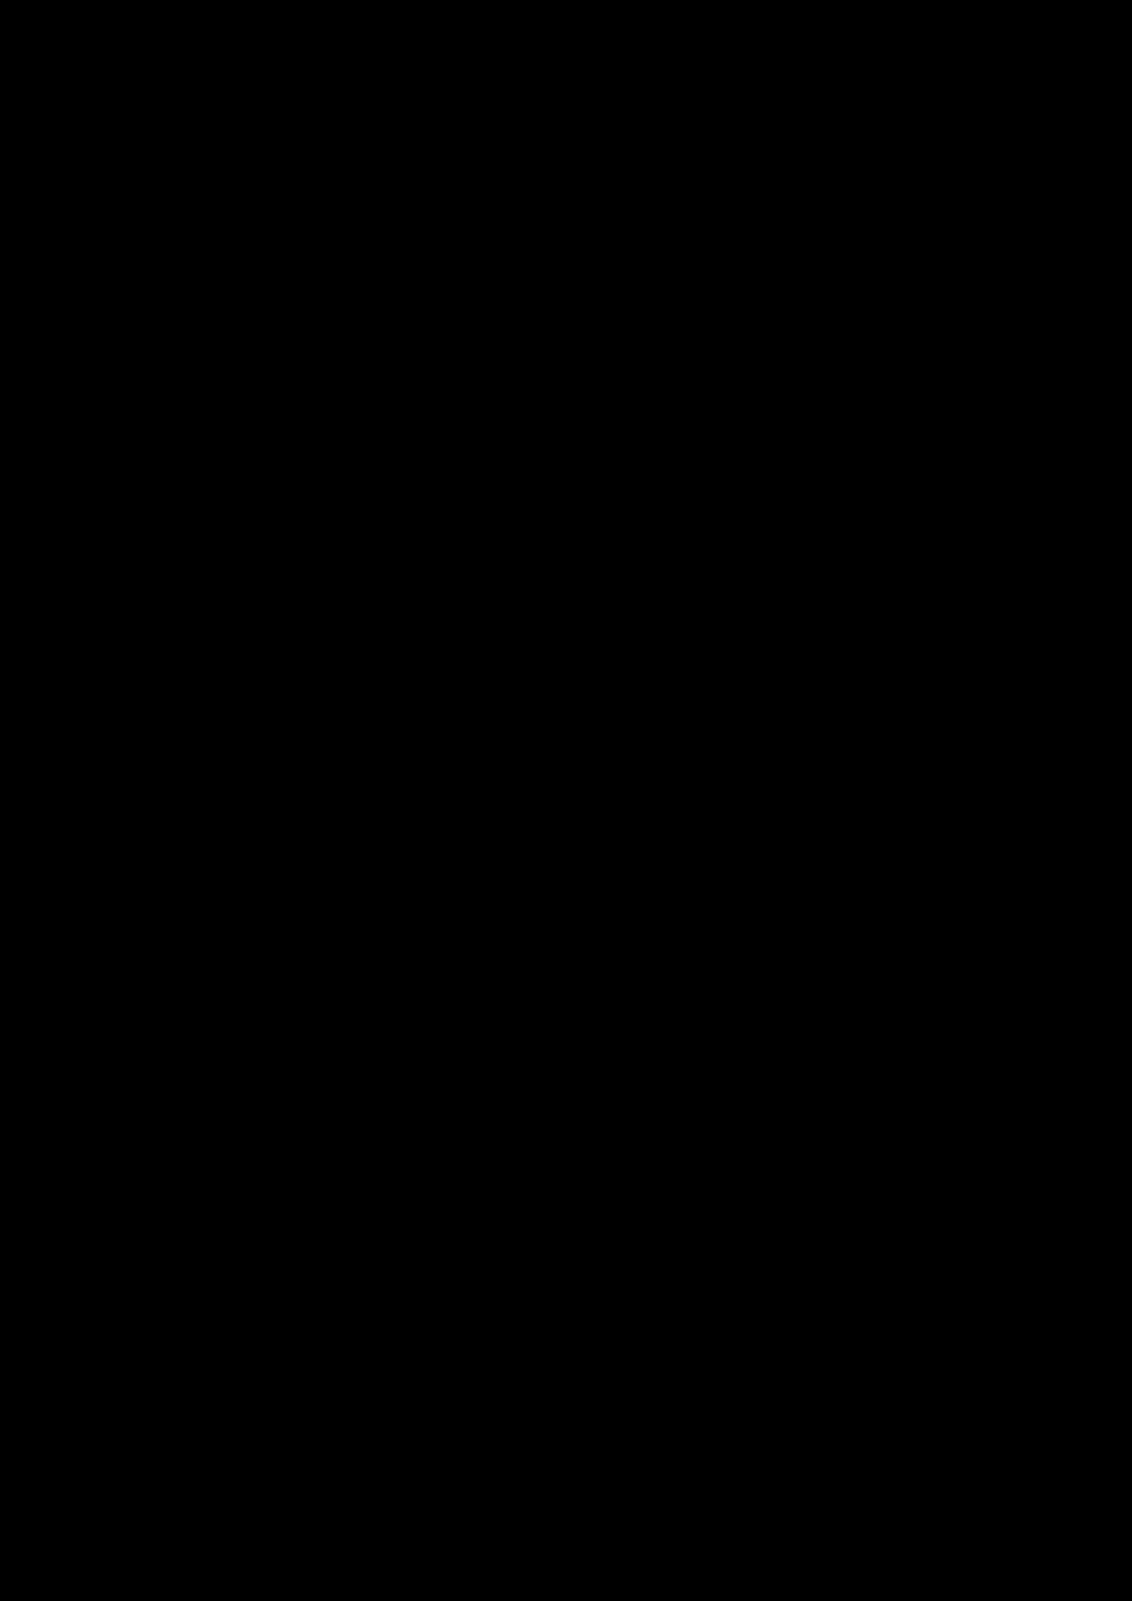 Okean Pustotyi slide, Image 32